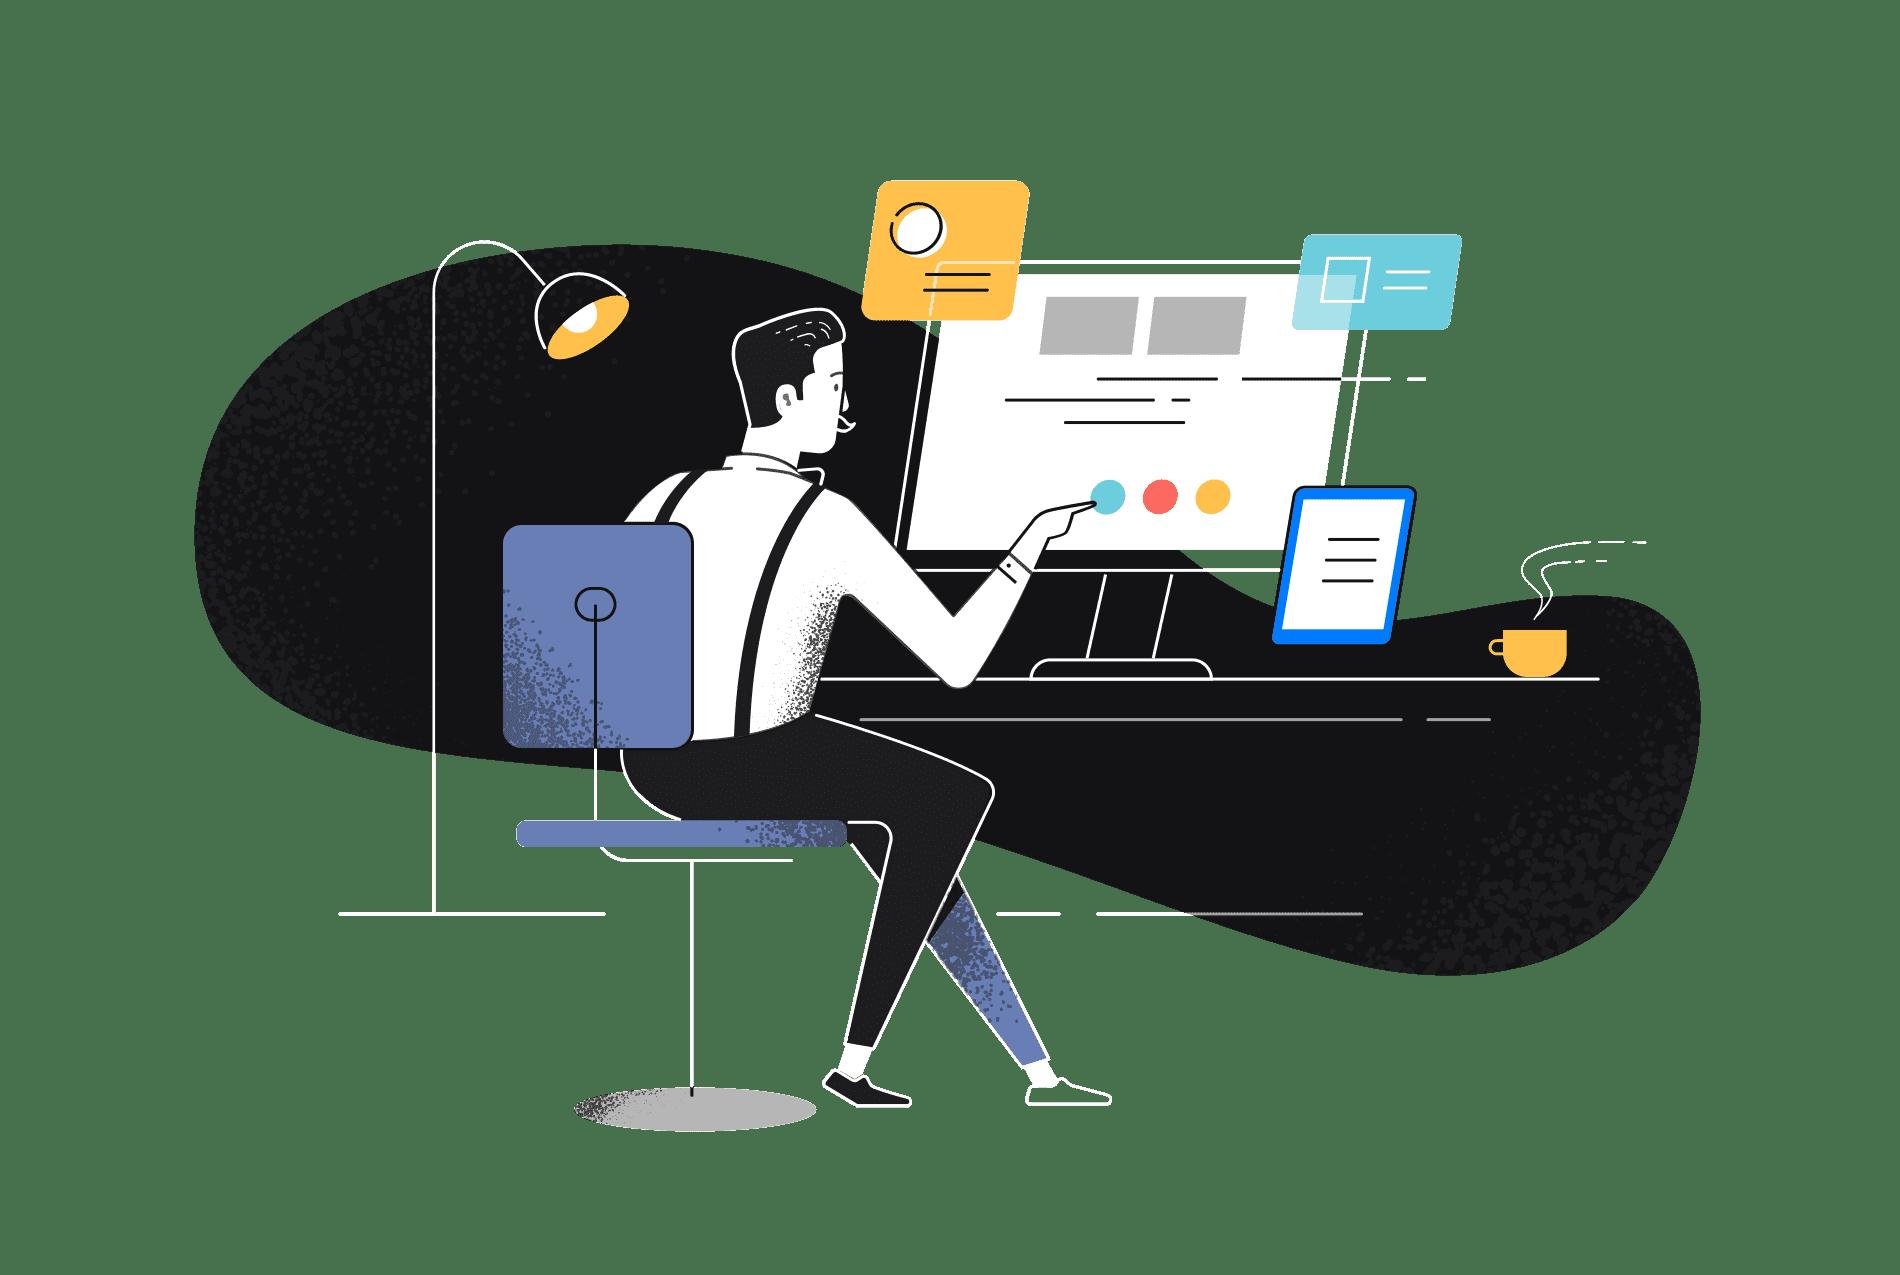 Nico at desk